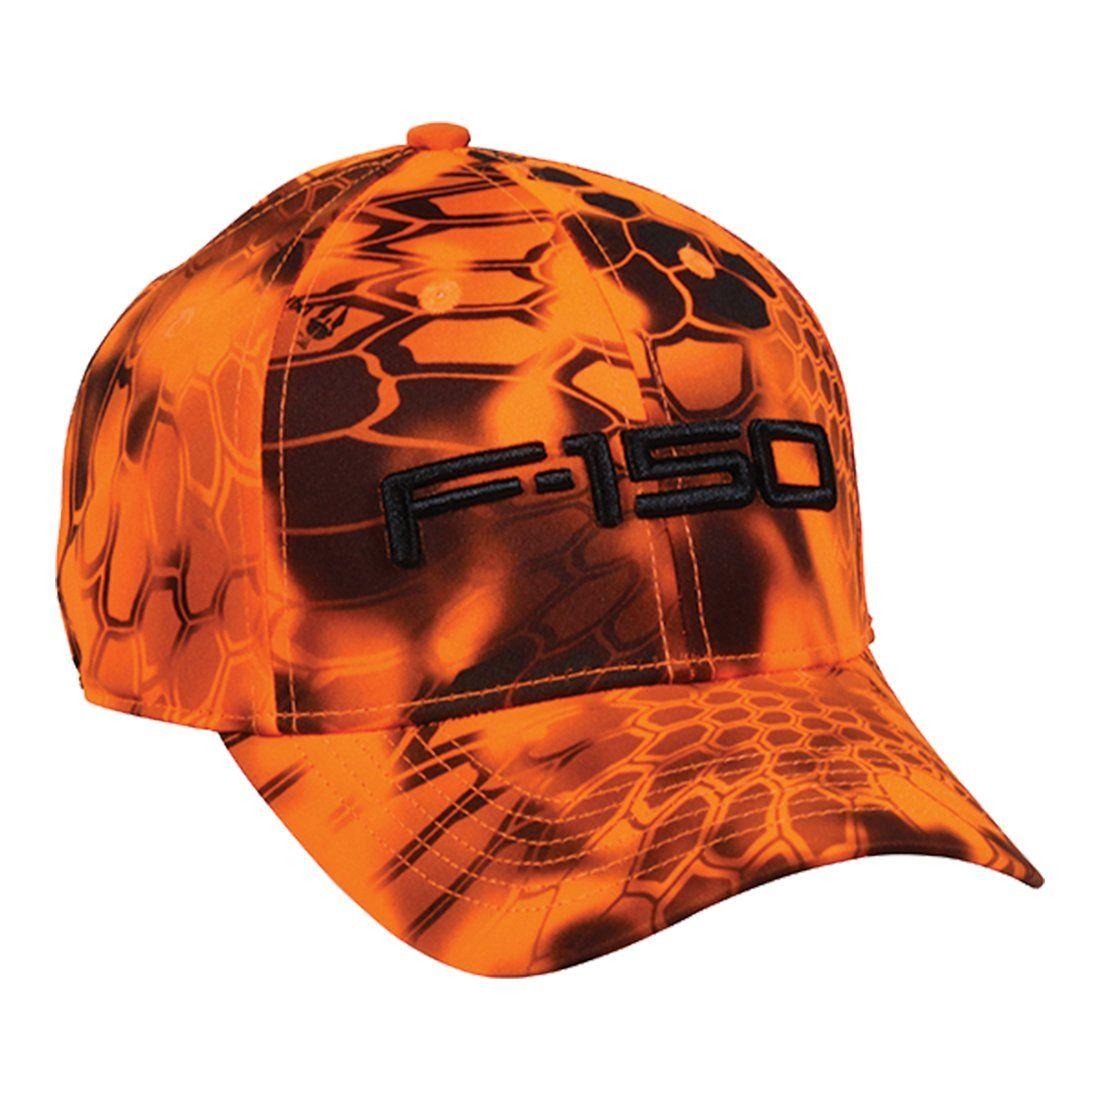 6346ba364c8 Outdoor Cap Men s Ford Blaze Camo Cap